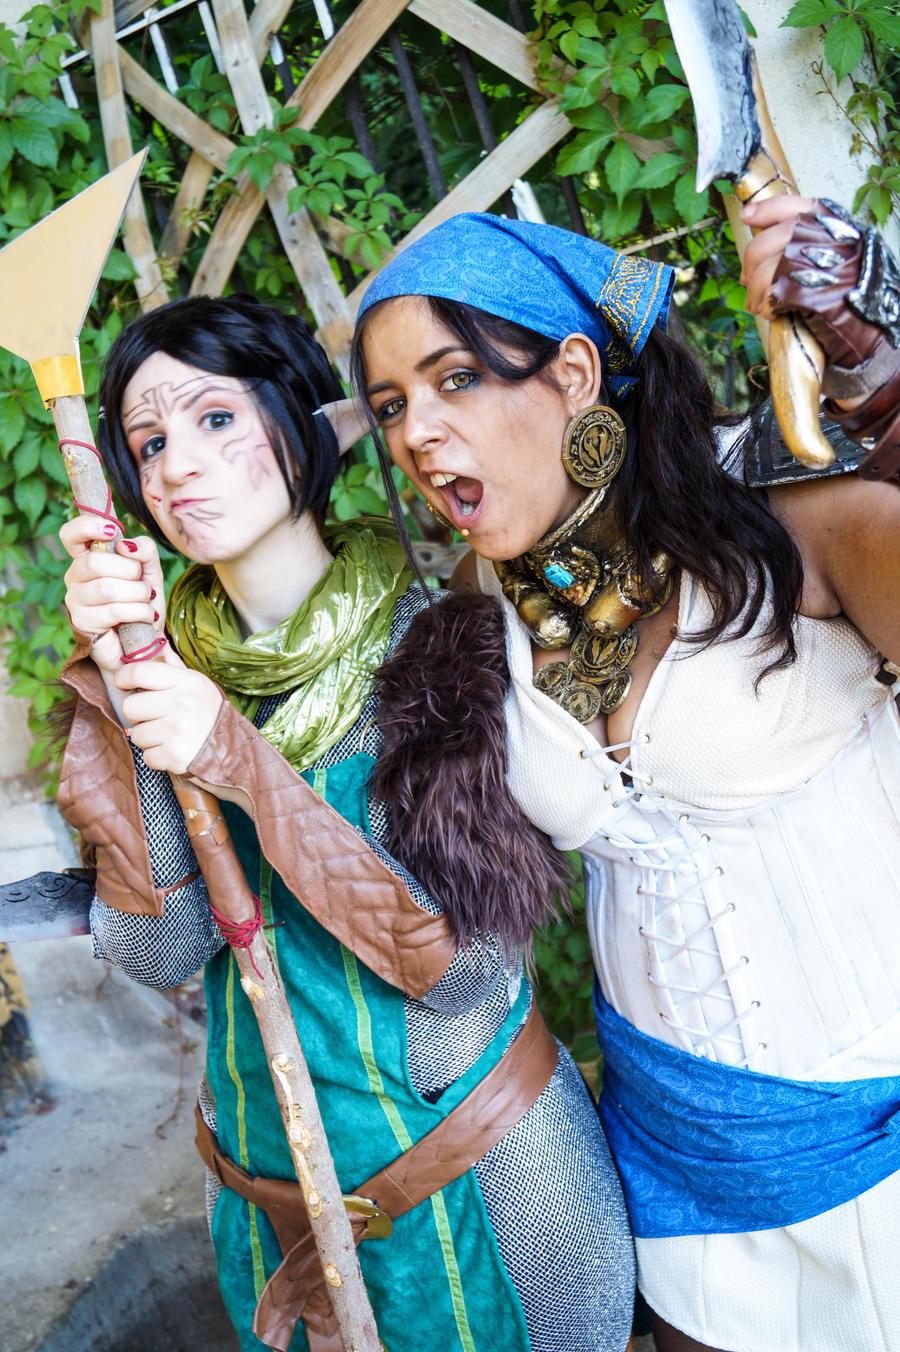 Isabela and Merrill by wilbur-kyriu